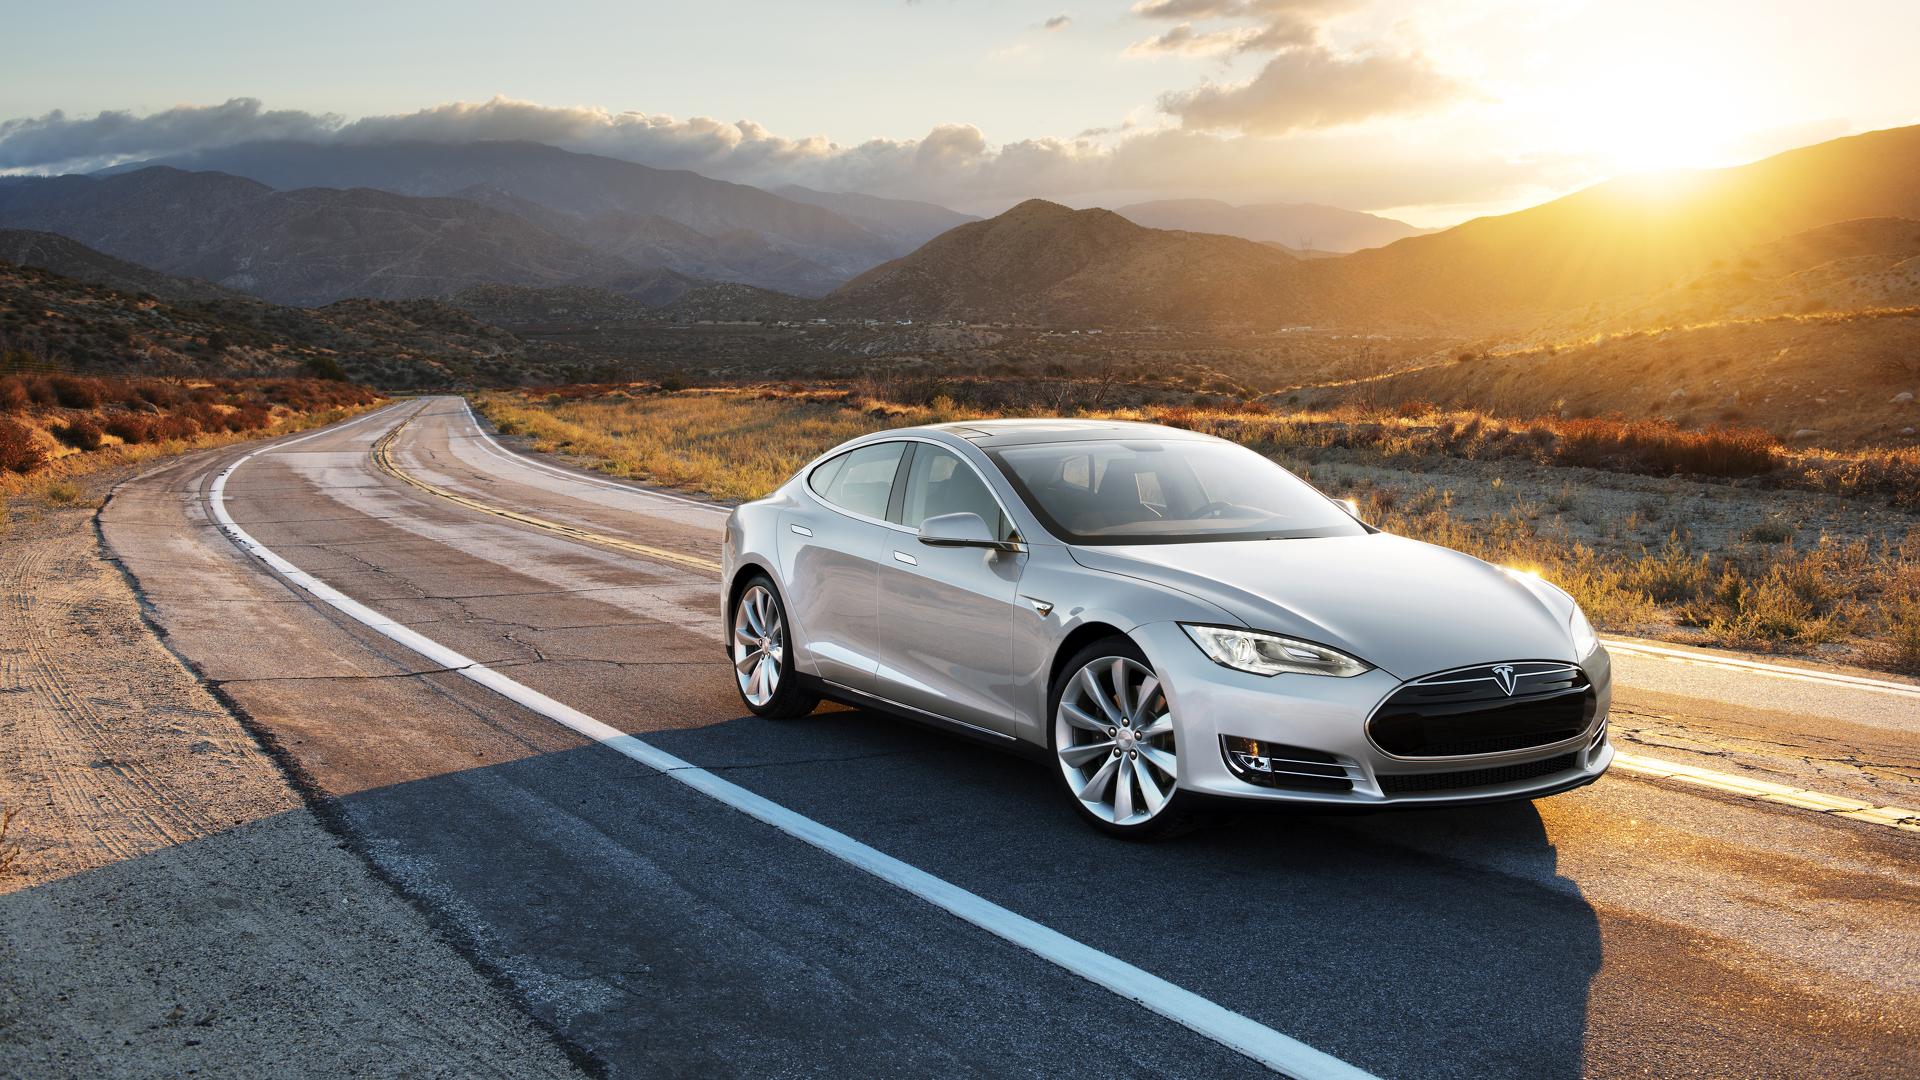 Tesla update 8.0 makes big changes to Autopilot, nav system